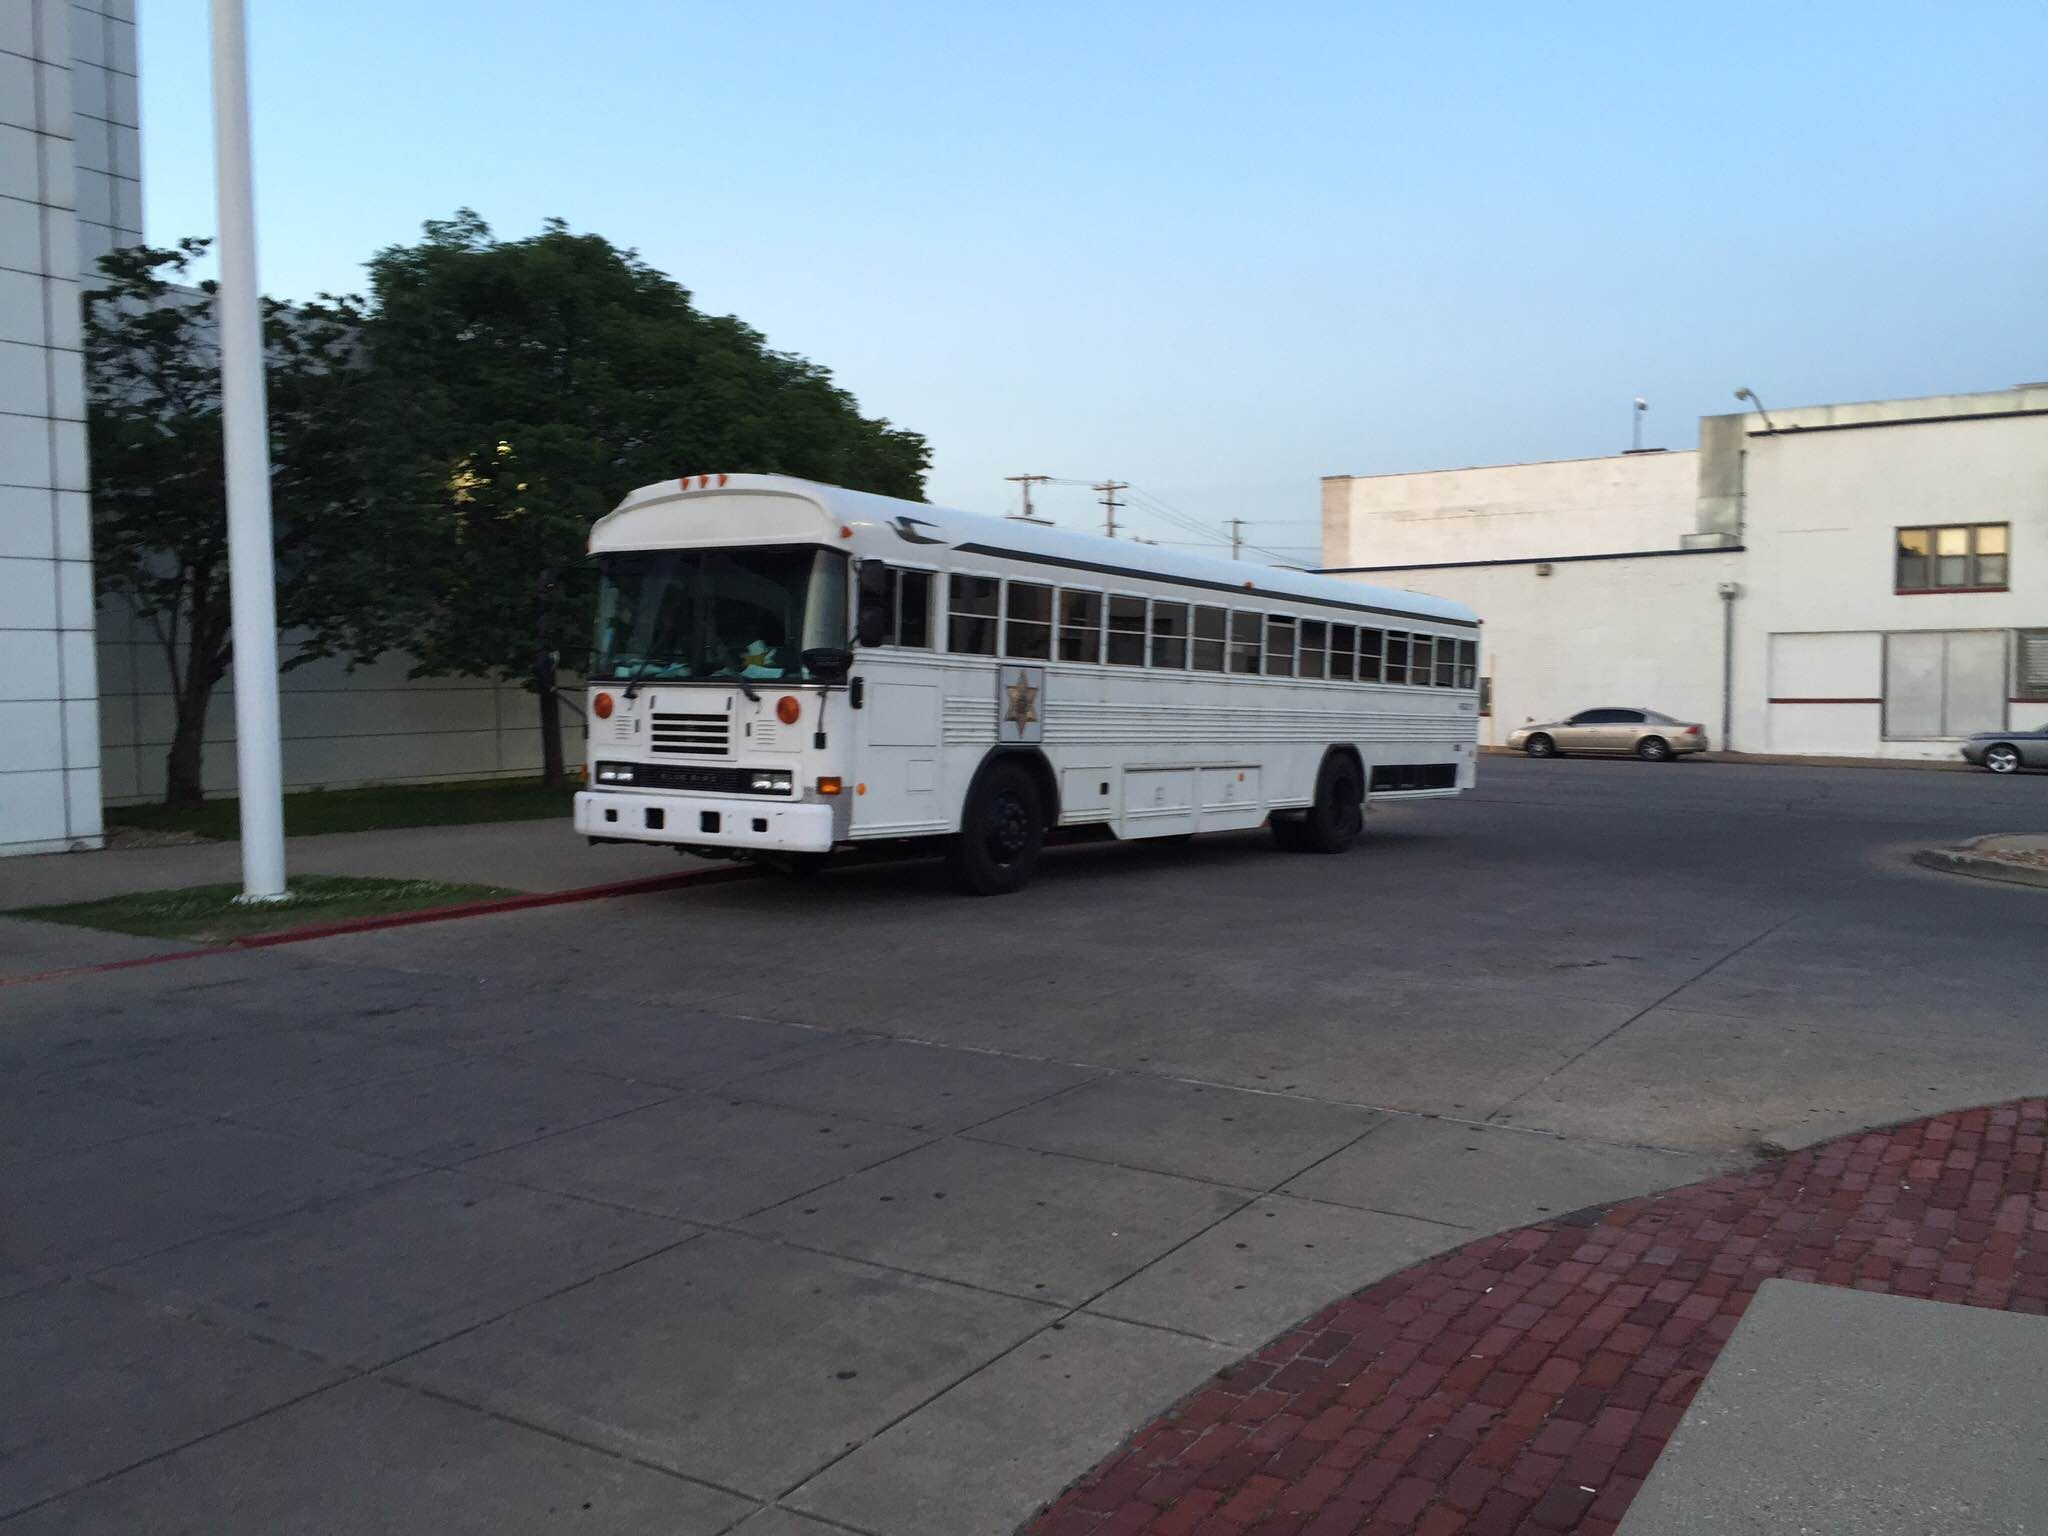 Http Www Tulsaroute66bailbonds Com Tulsa County Jail Tulsa County Jail Transport Bus This Is One Of The Few Ways To Transport Inm County Jail Jail Alameda